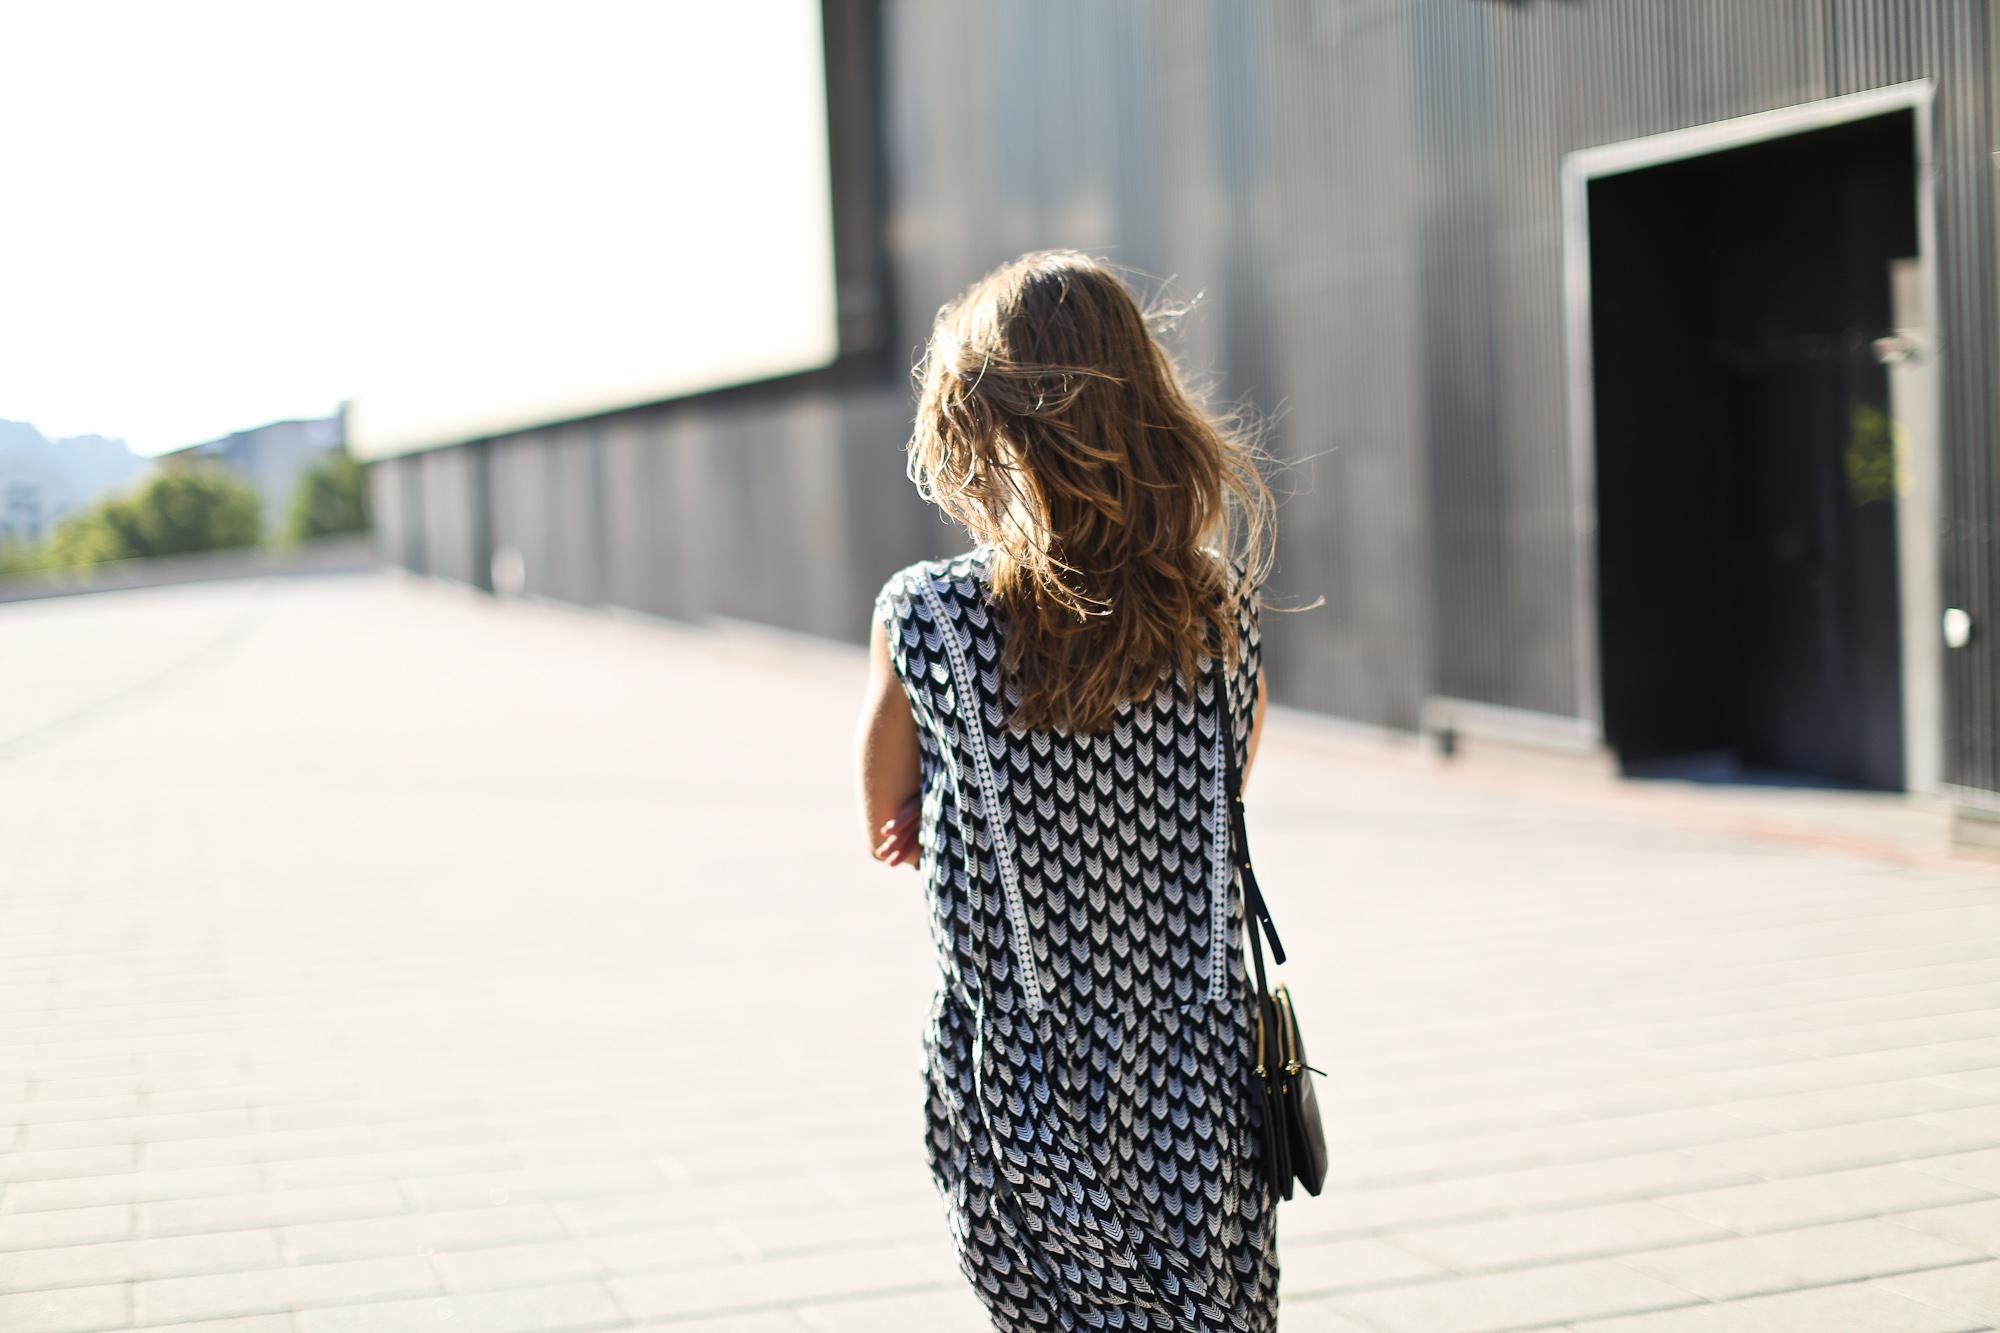 Clochet_streetstyle_chicwish_midi_printed_summer_dress